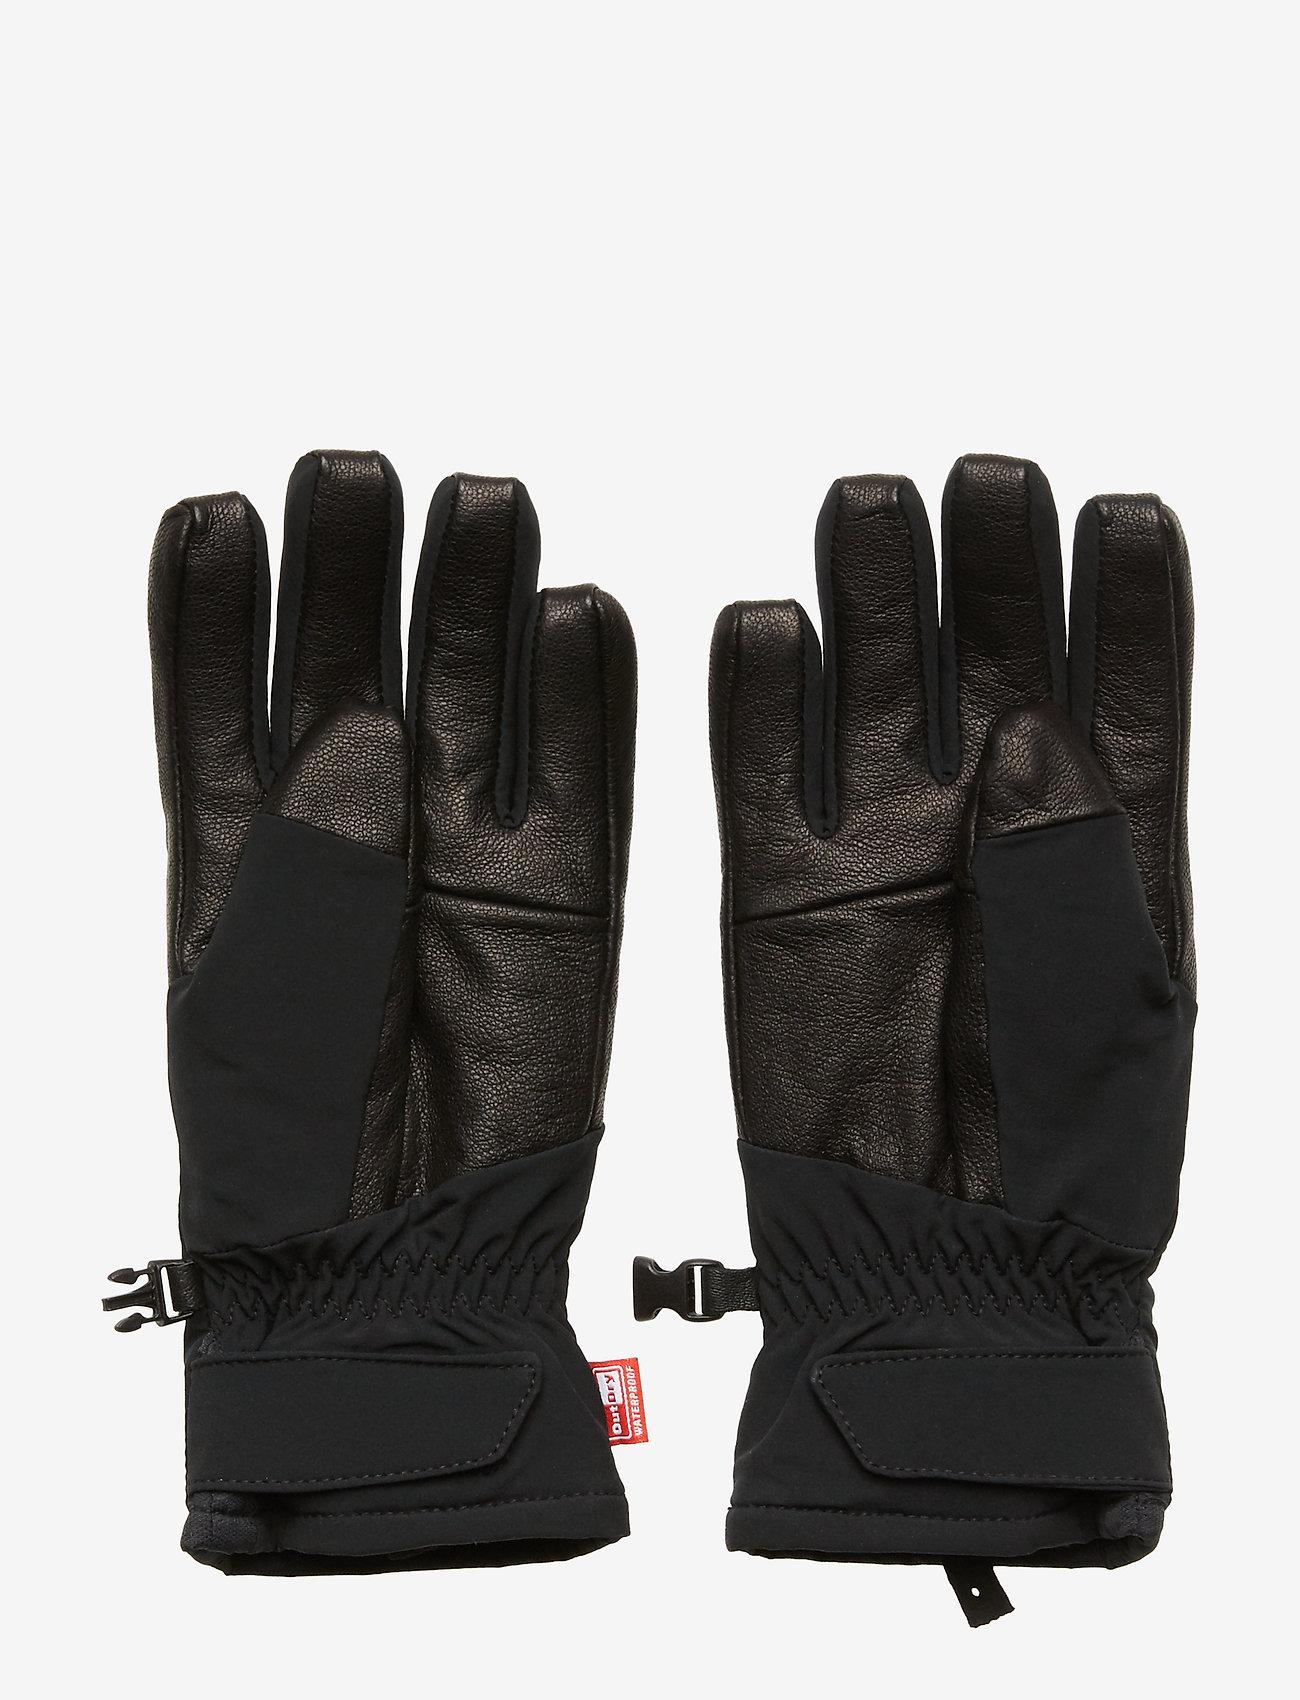 Columbia - W Powderkeg II Glove - akcesoria - black - 1